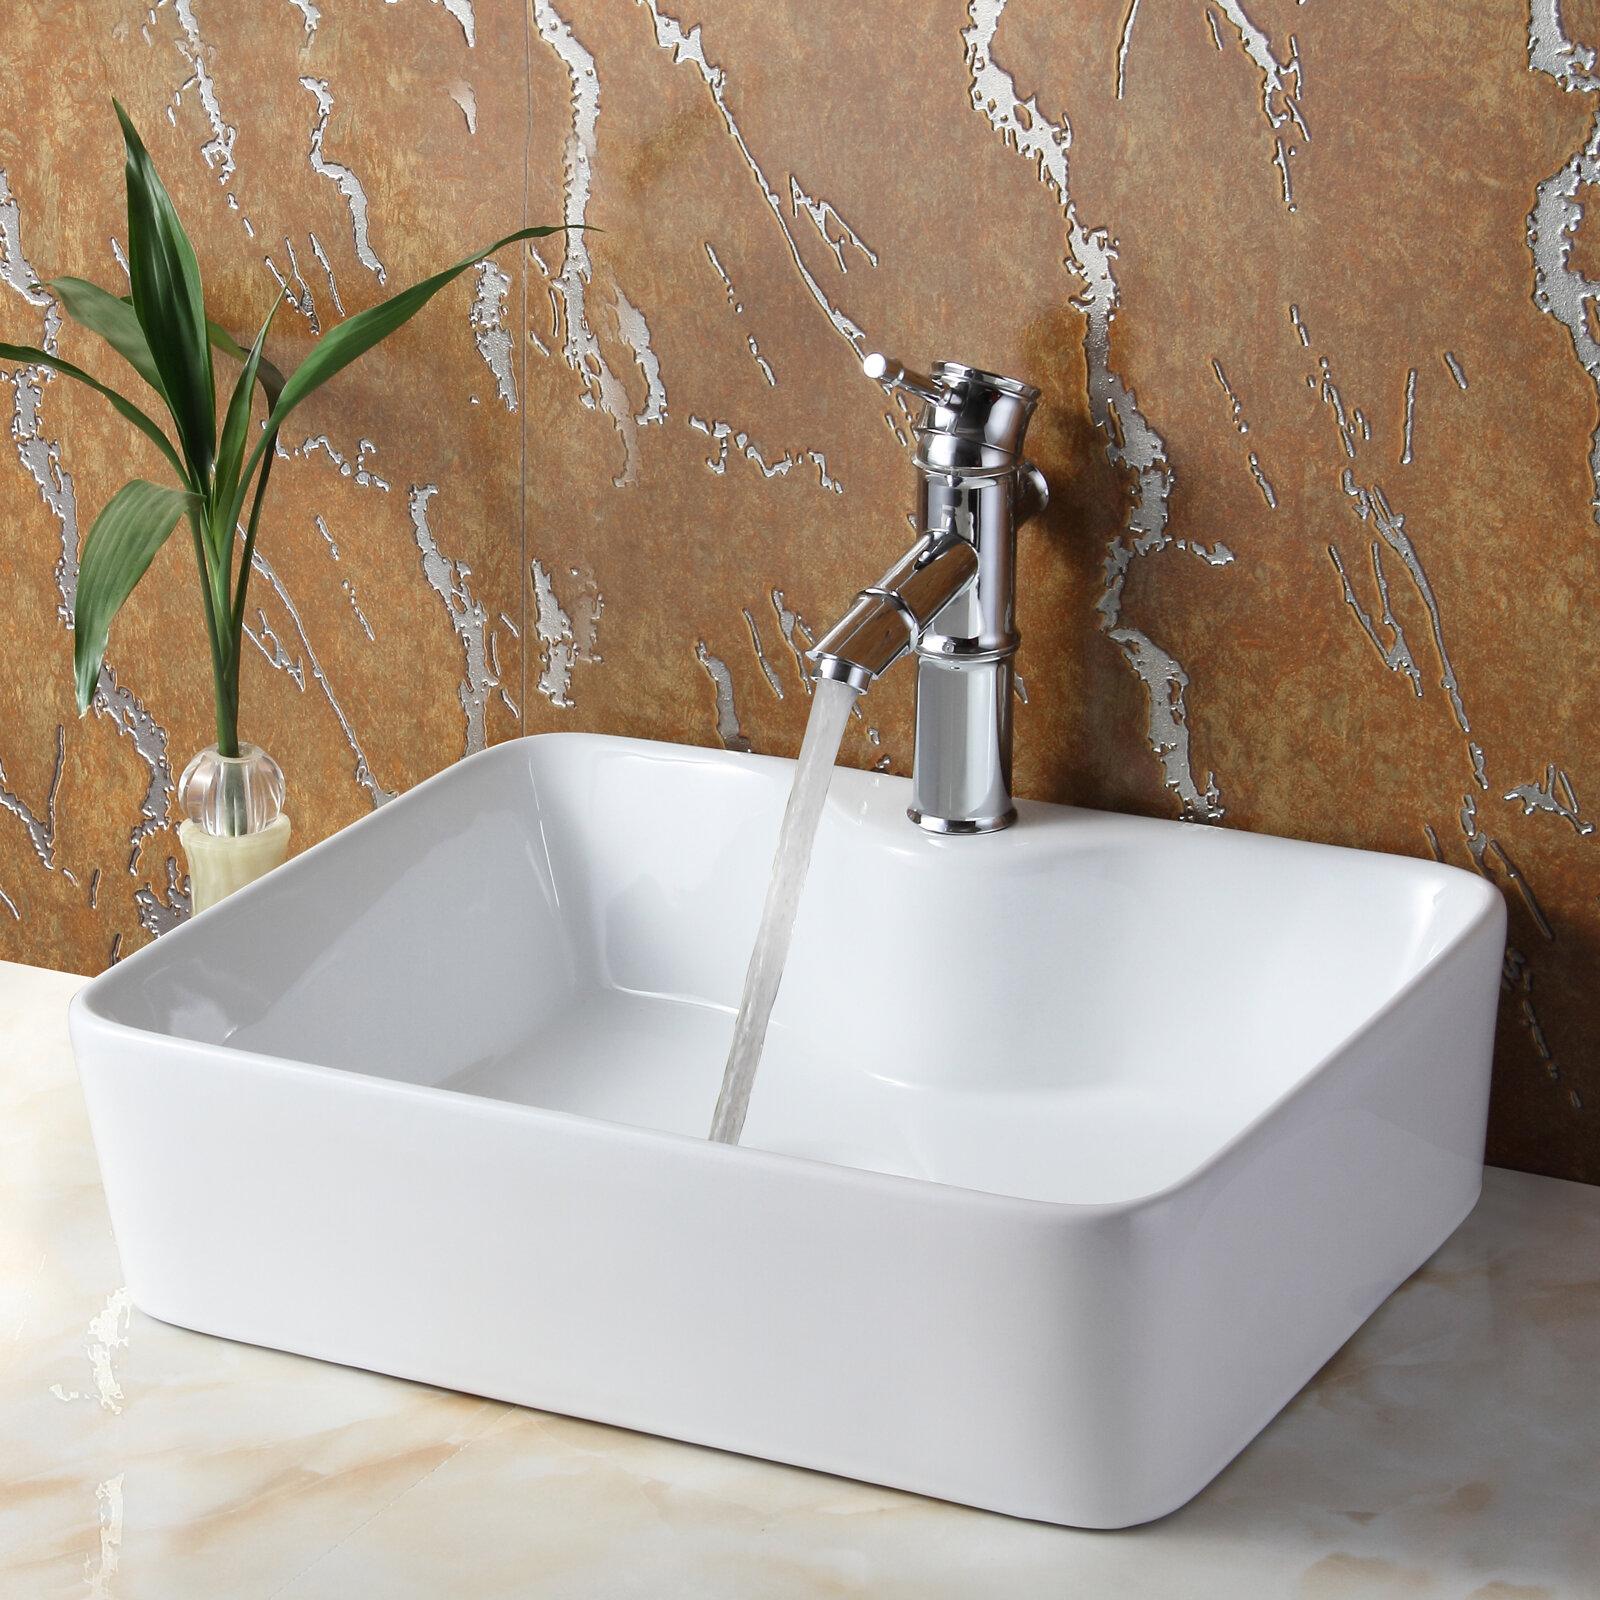 Elite Ceramic Rectangular Vessel Bathroom Sink U0026 Reviews | Wayfair